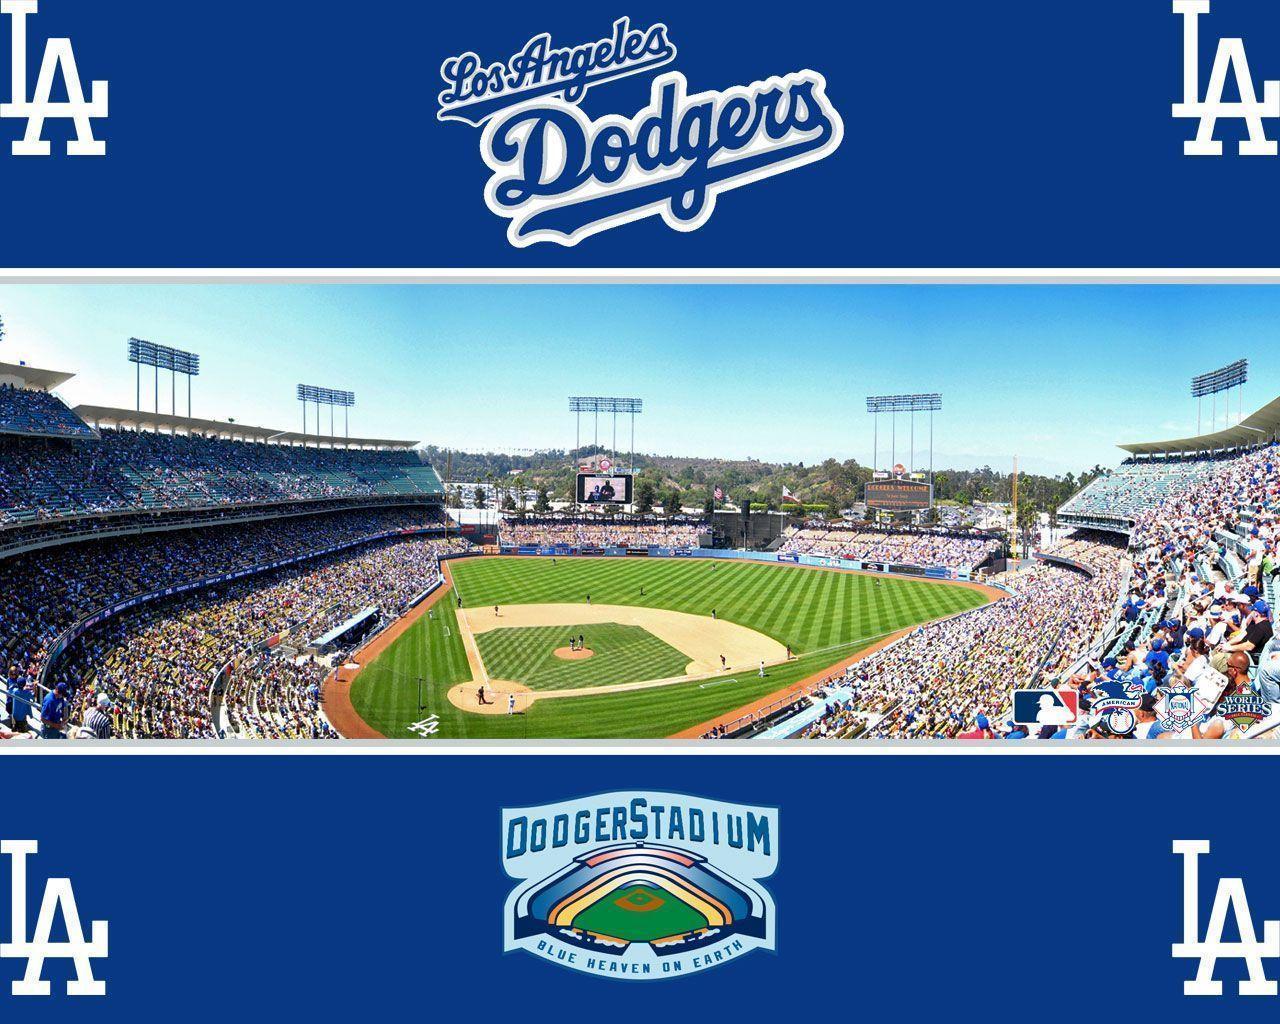 Dodger stadium wallpaper